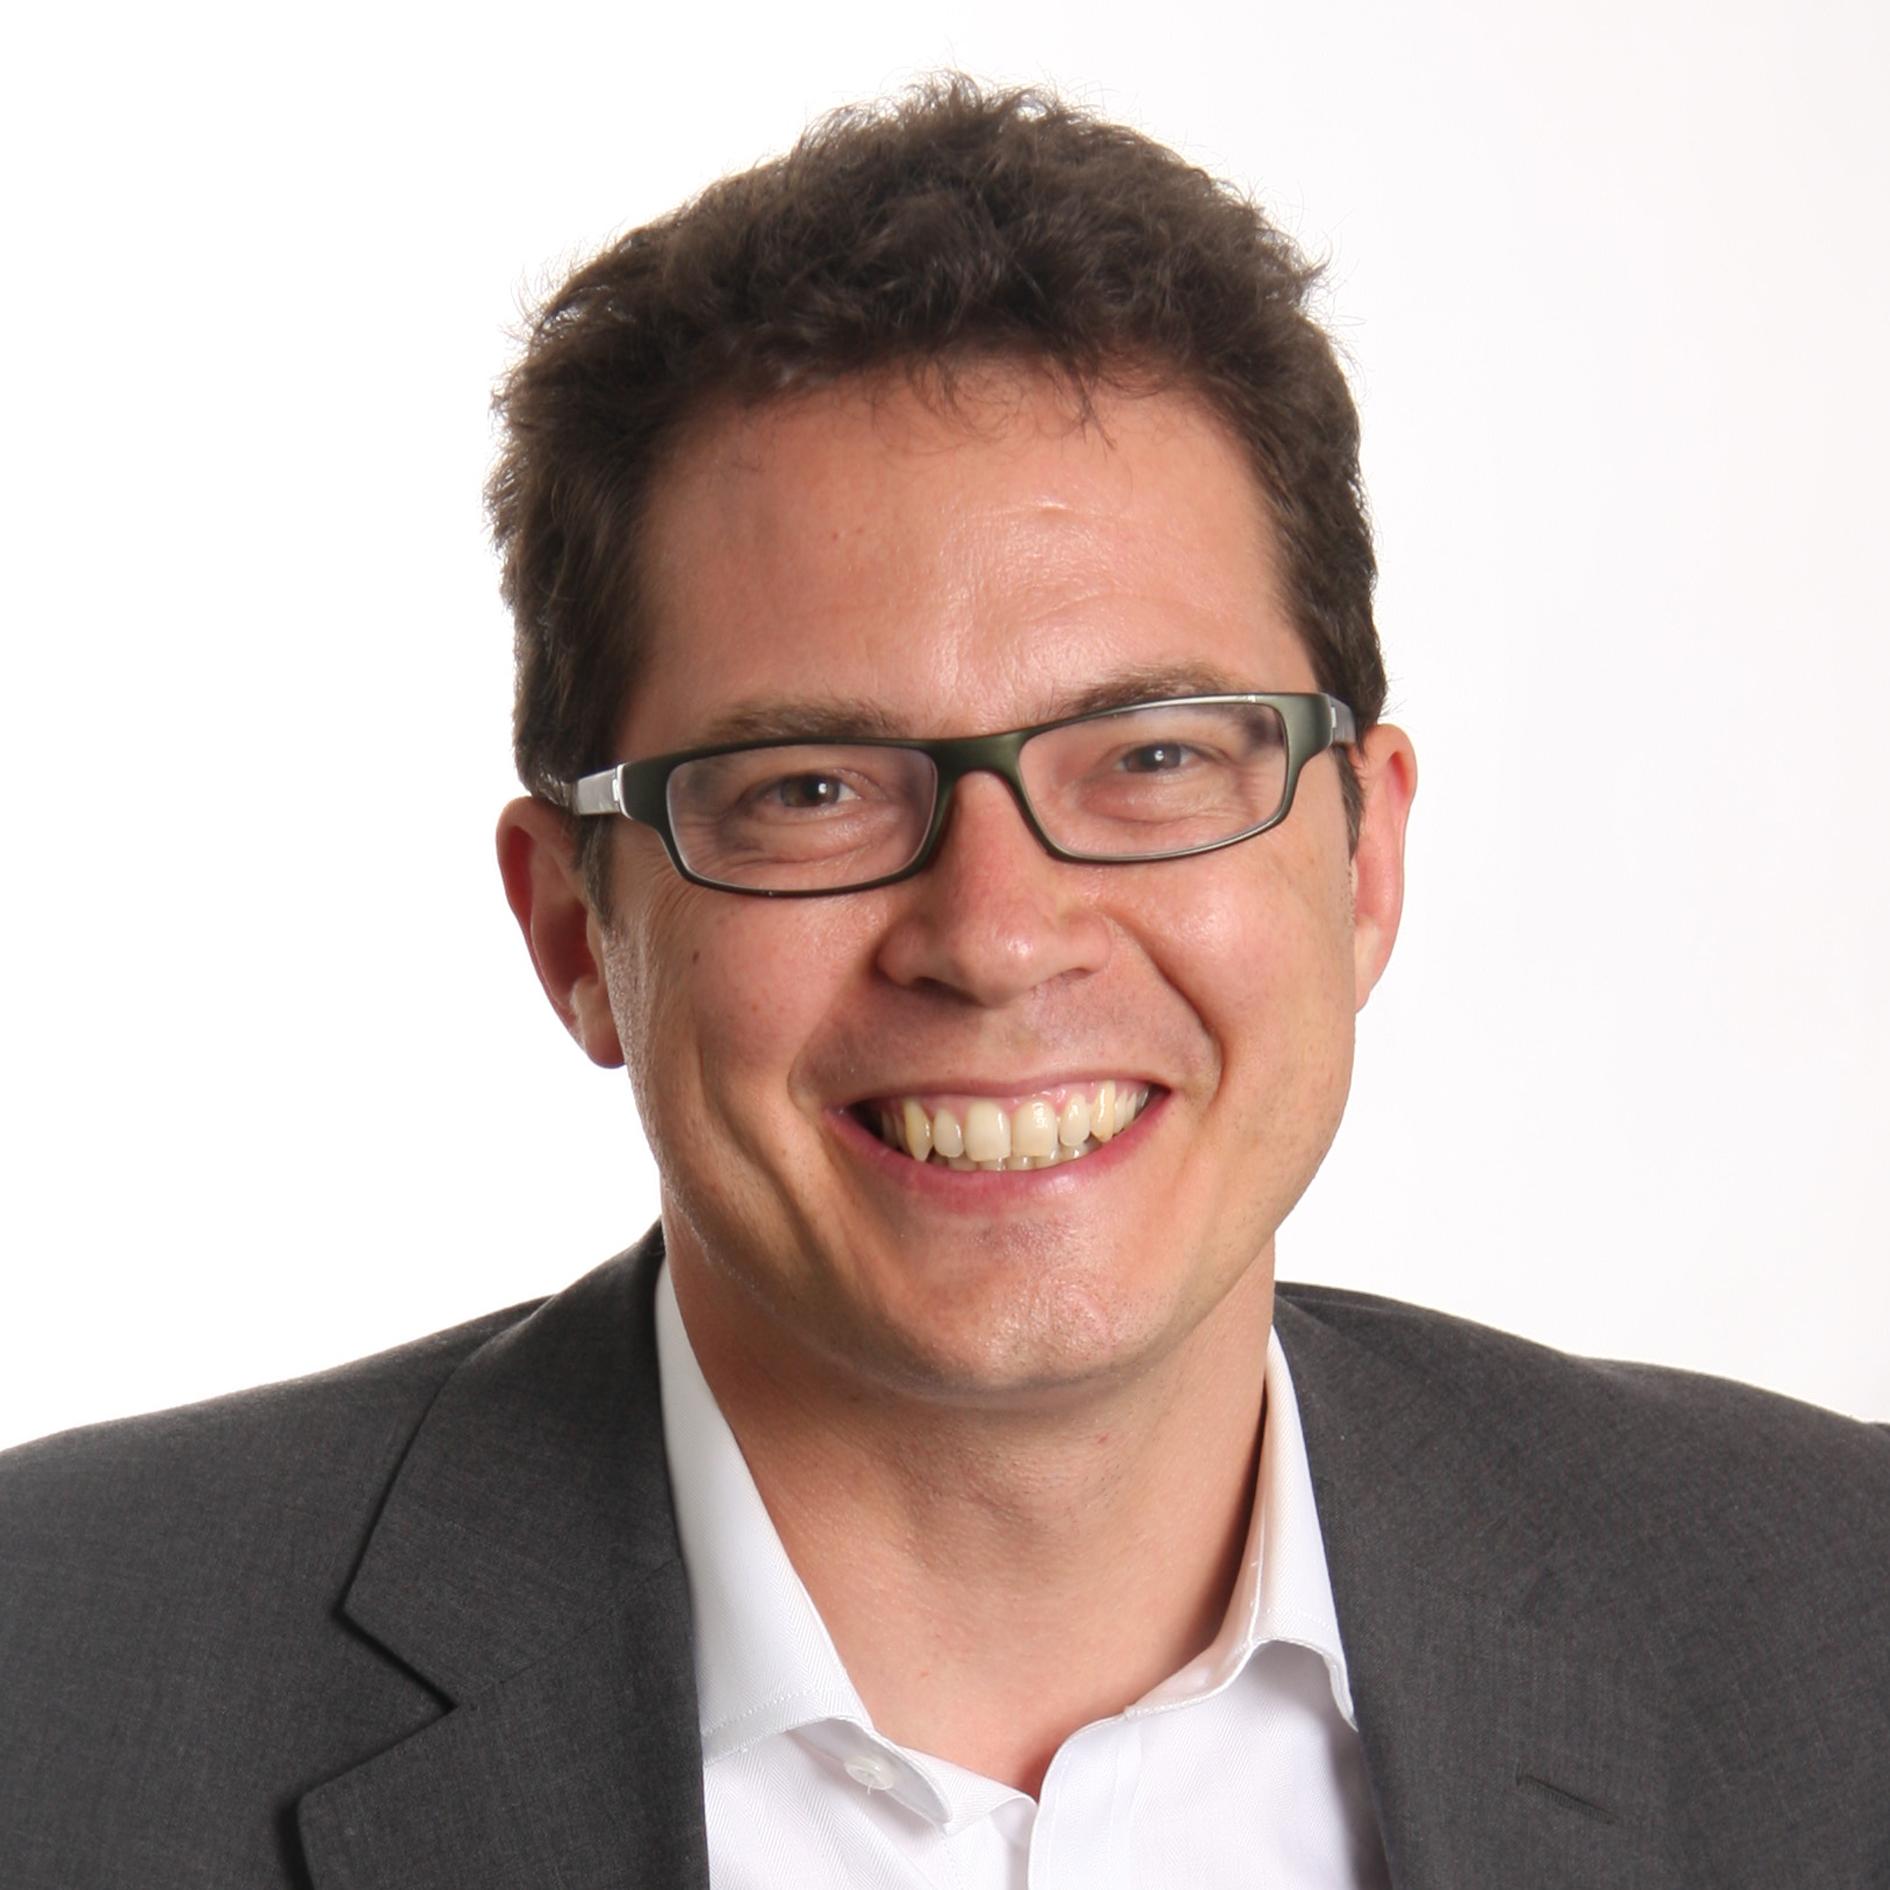 Ben Page - Chief Executive of Ipsos MORI